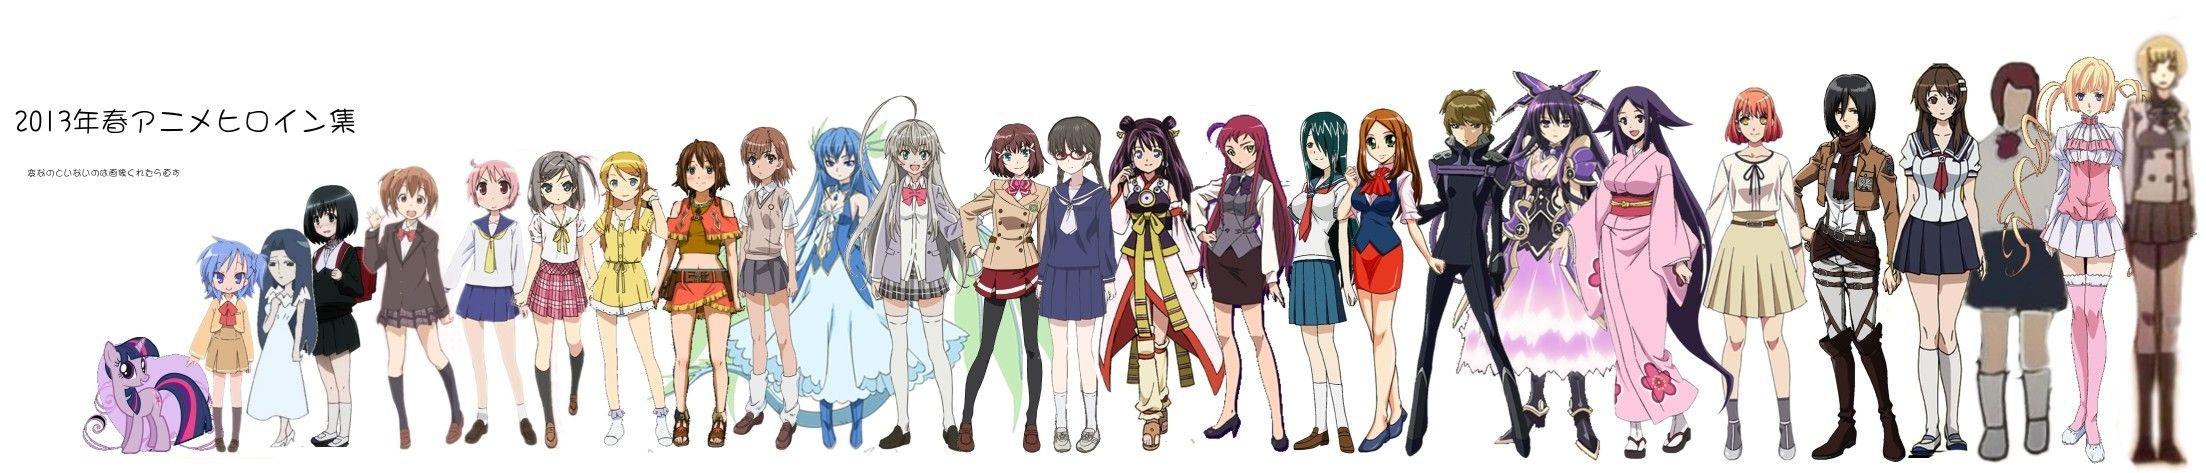 6 Foot Tall Anime Characters : 건강해지길 바라는 더스크 하우스 ch 이번 분기 애니 히로인 랭킹ㅋㅋㅋㅋㅋㅋㅋ